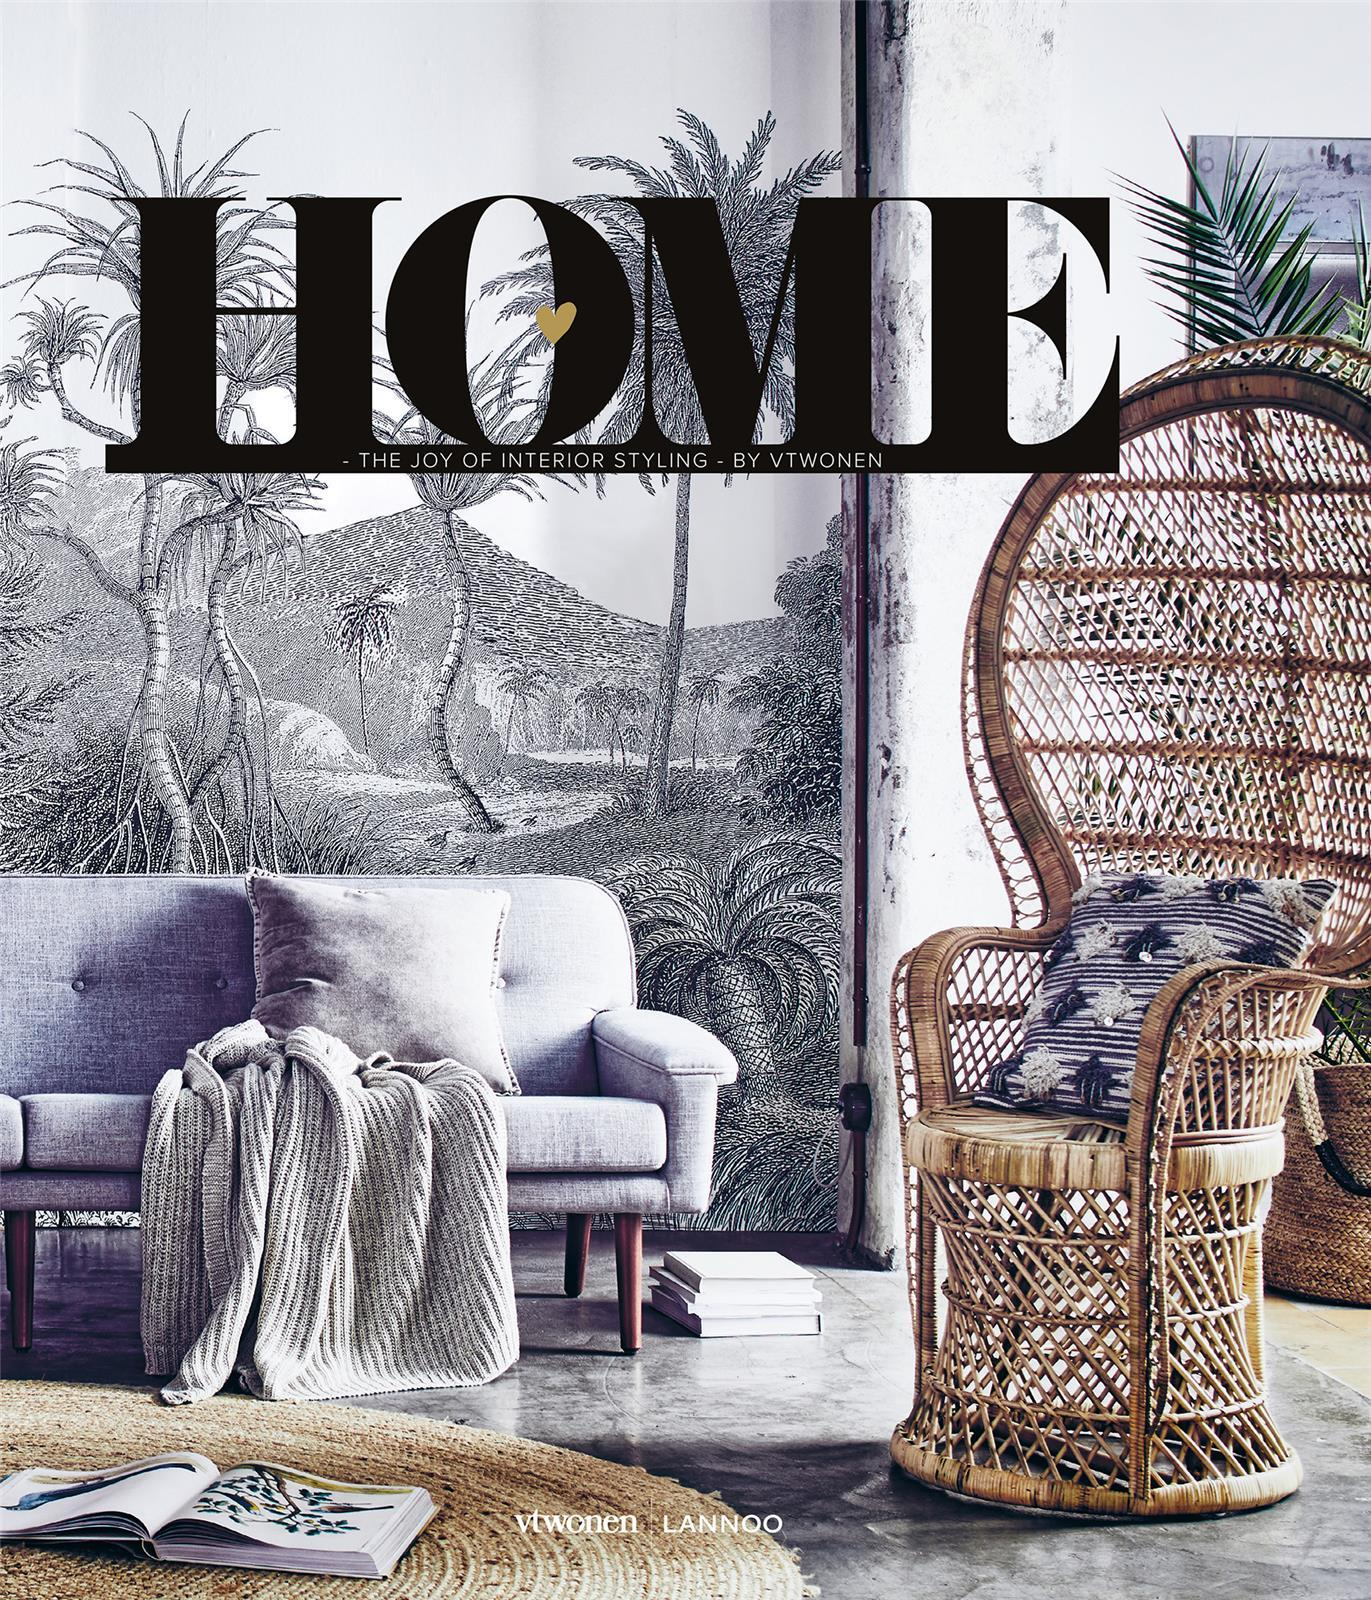 VT WONEN : HOME - THE JOY OF INTERIOR STYLING /ANGLAIS